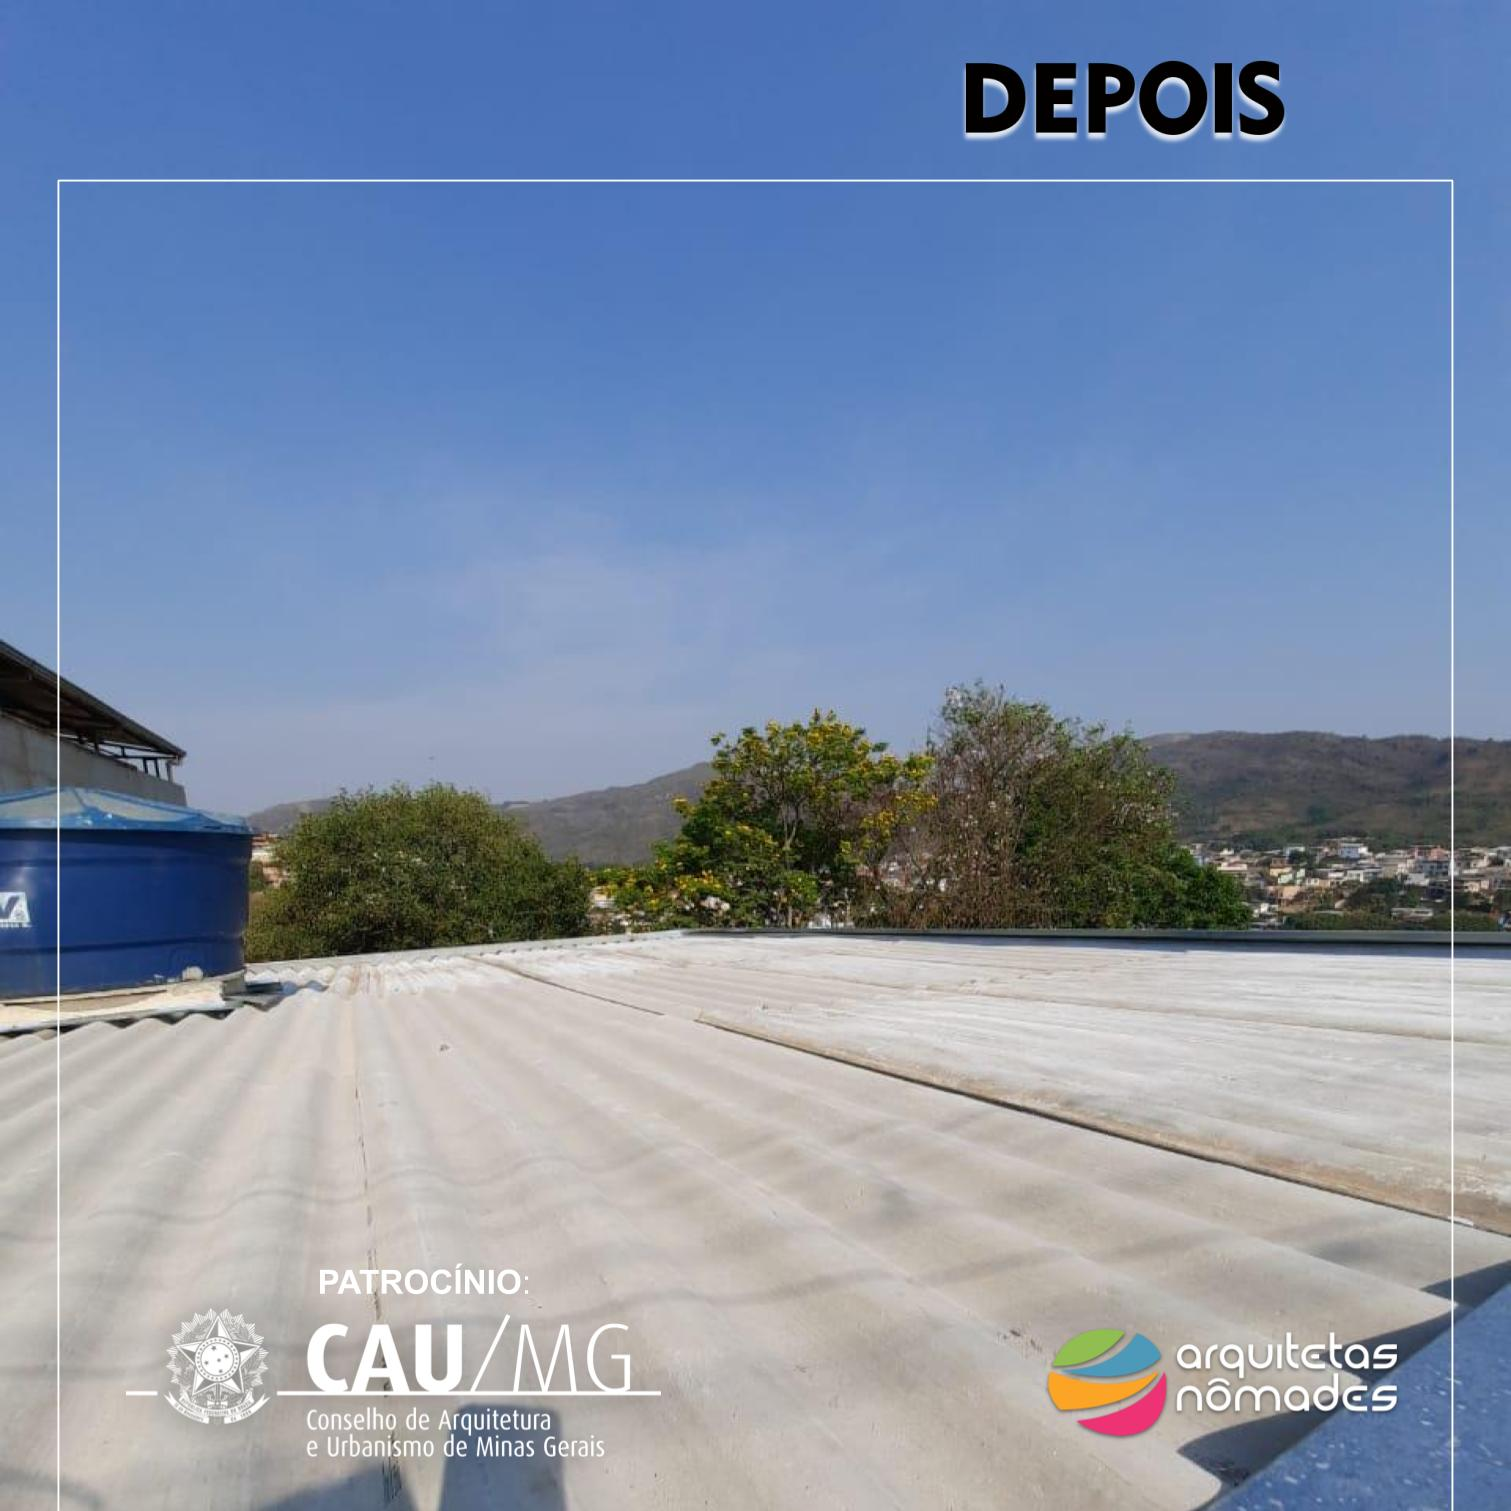 DEPOIS2